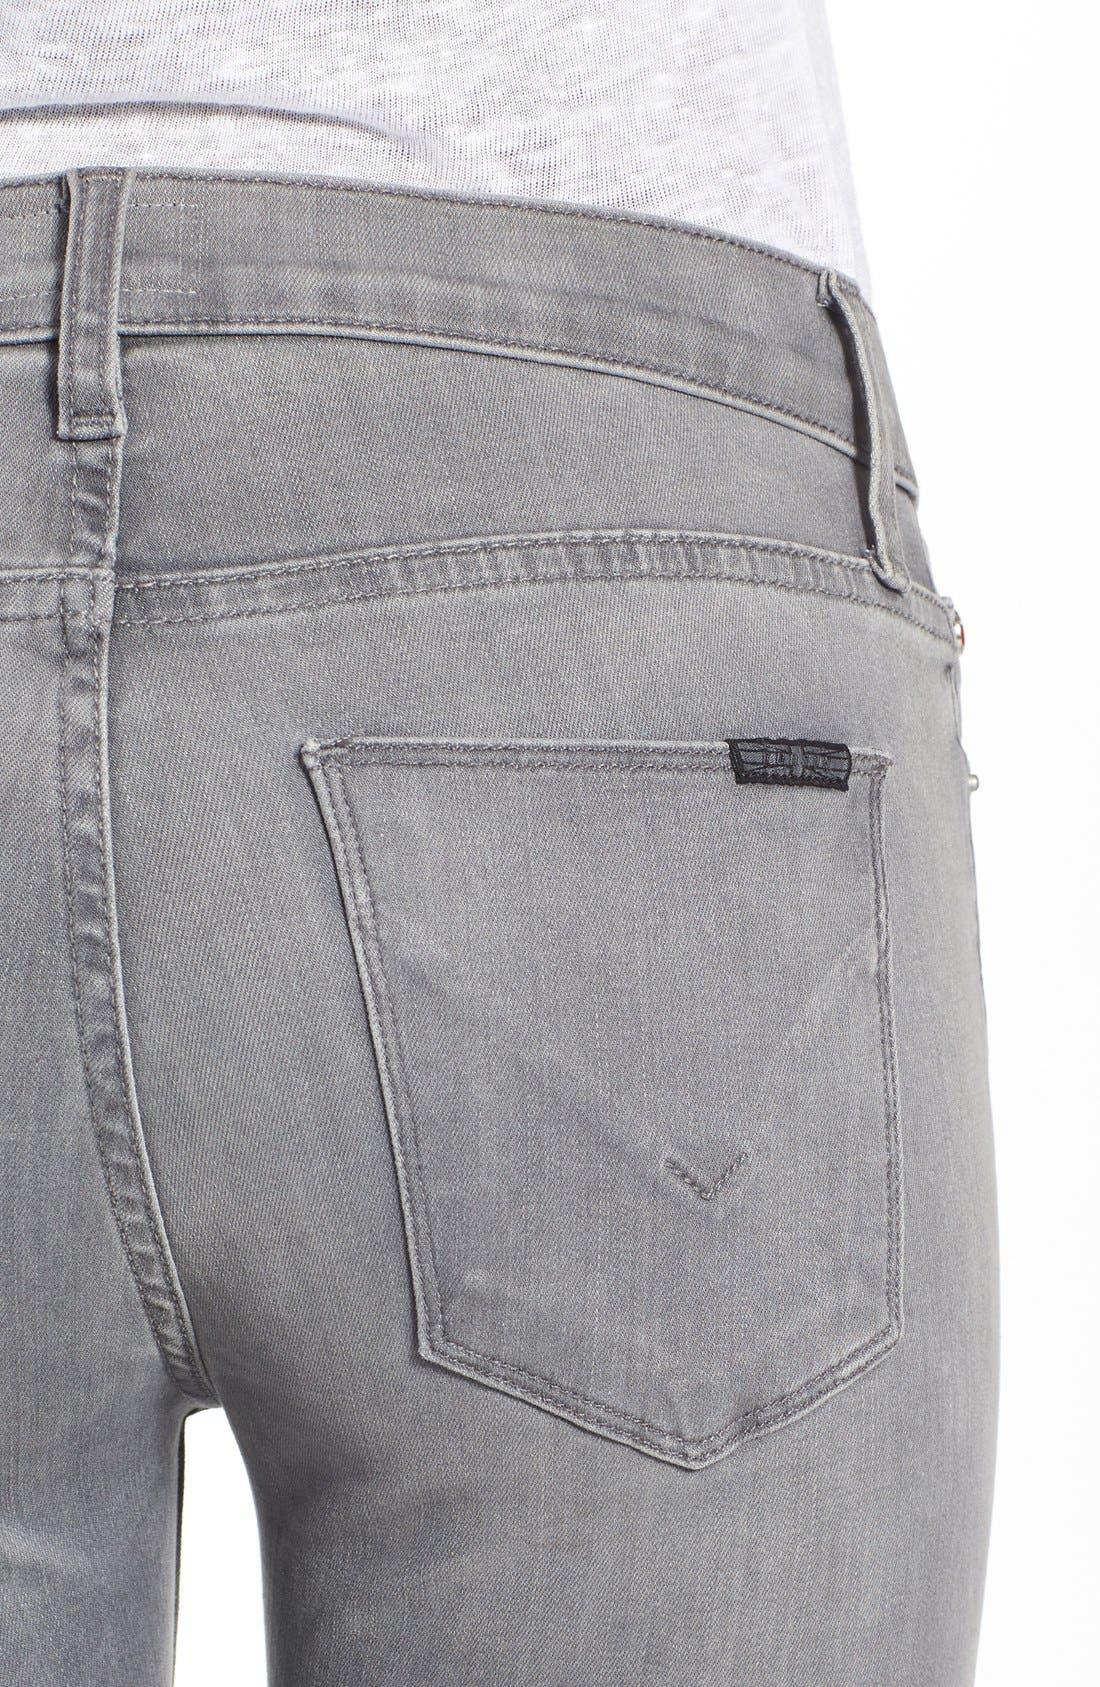 'Nico' Super Skinny Jeans,                             Alternate thumbnail 4, color,                             Spark Plug